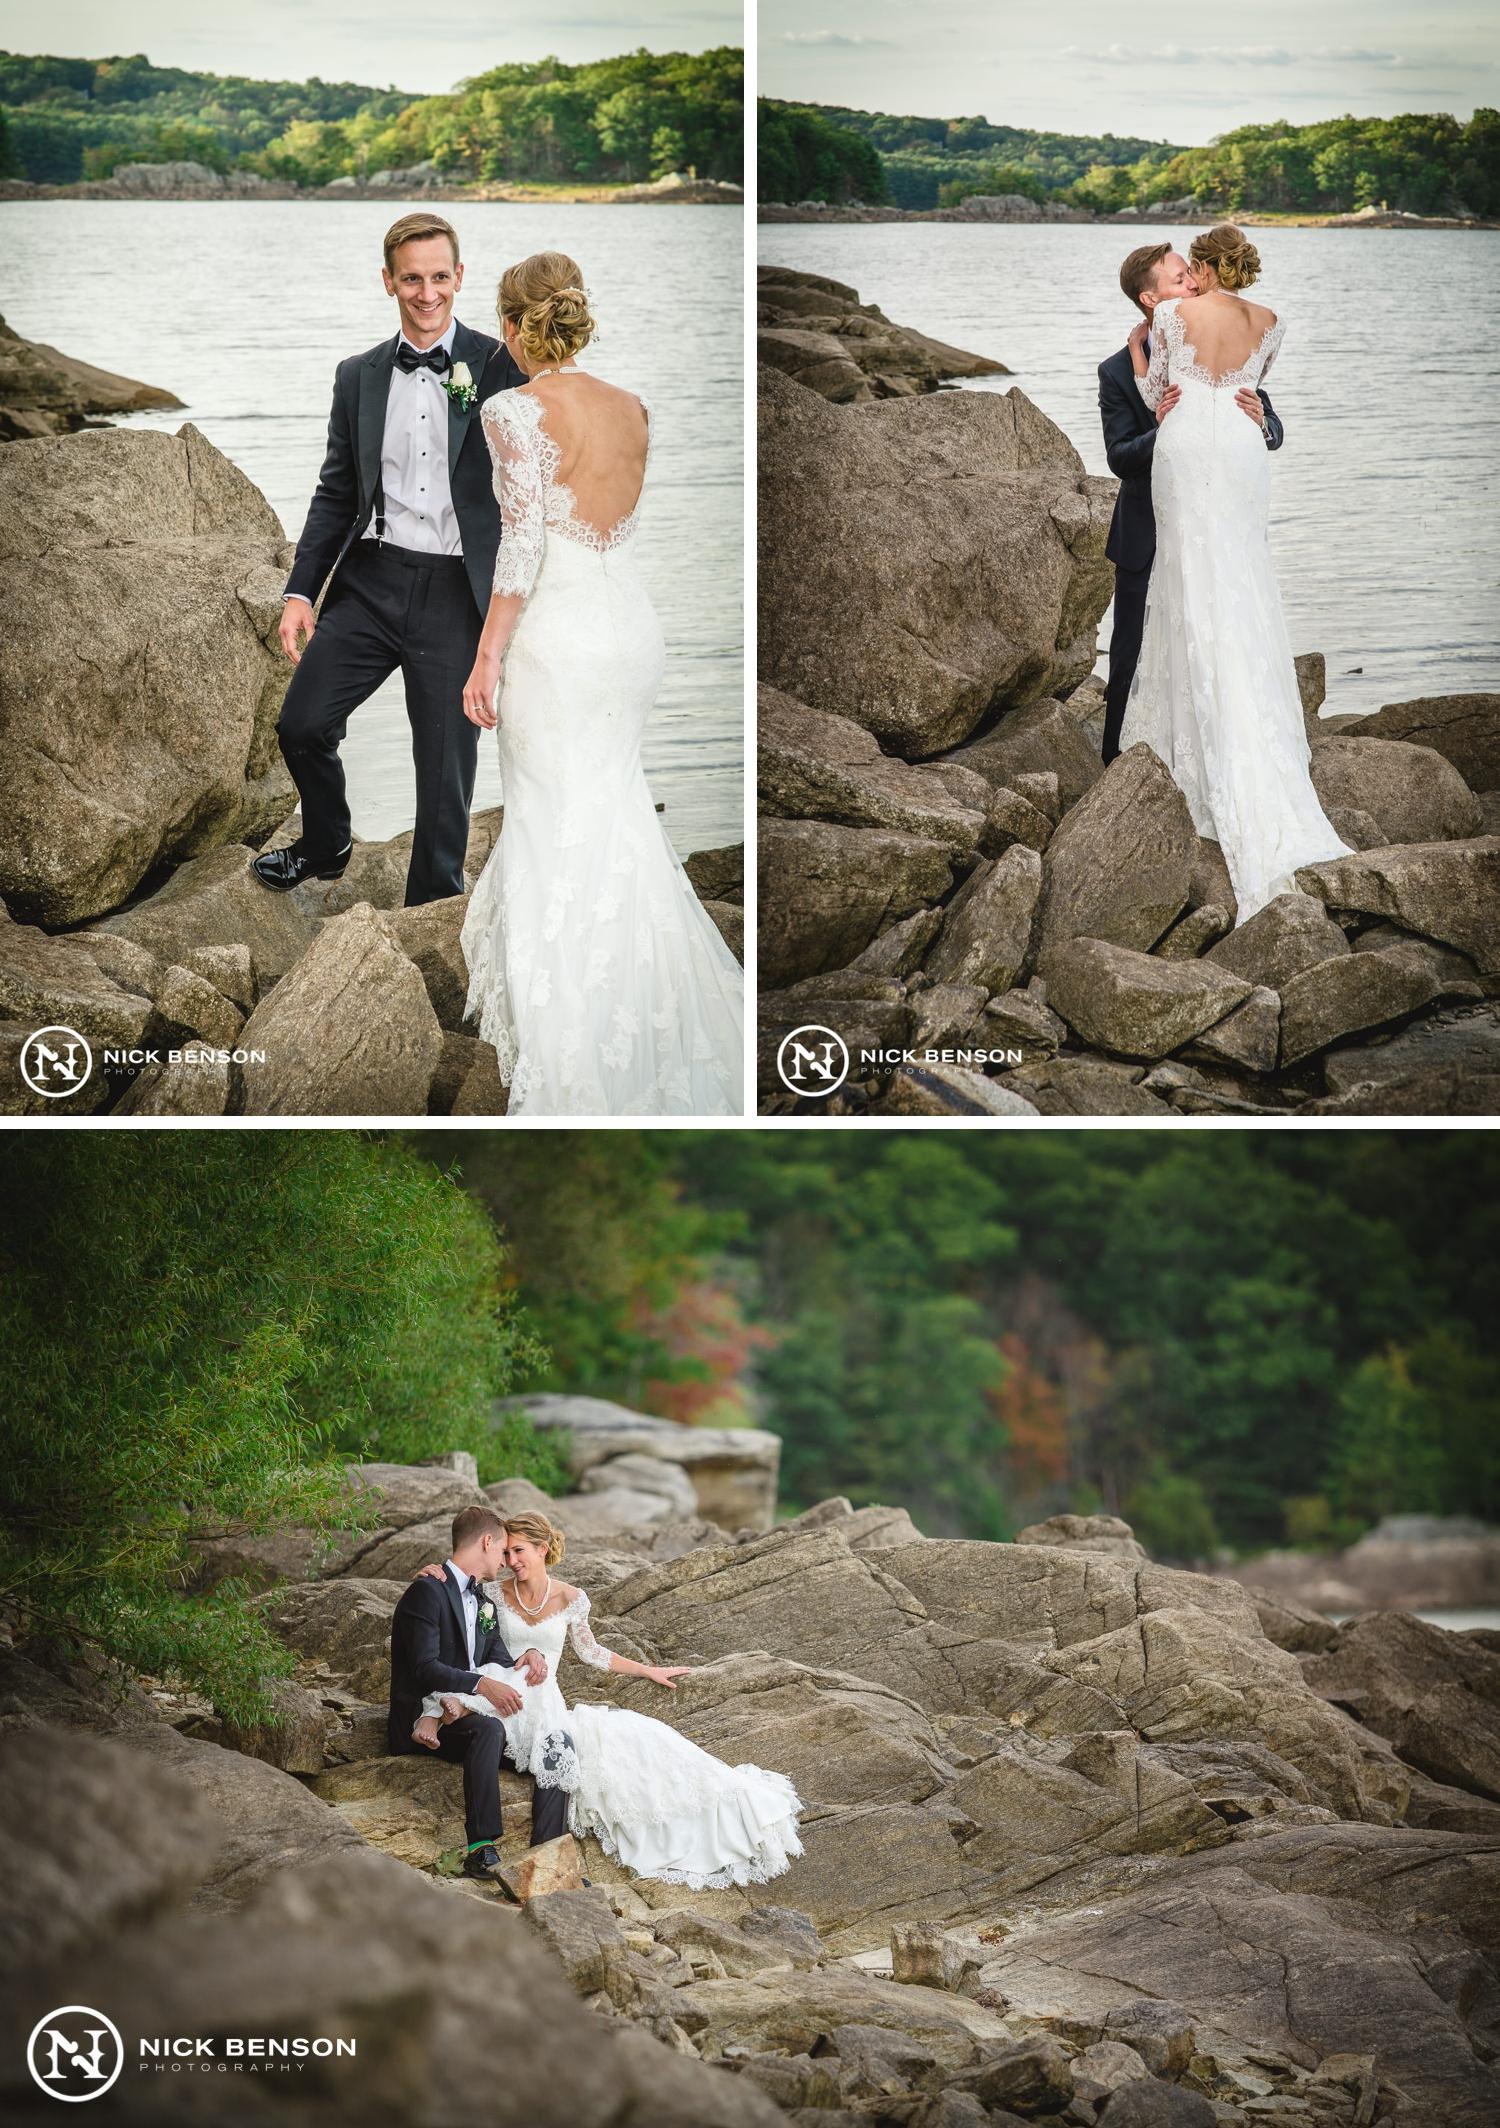 CT Wedding Photographer, First Look, Nick Benson Photography